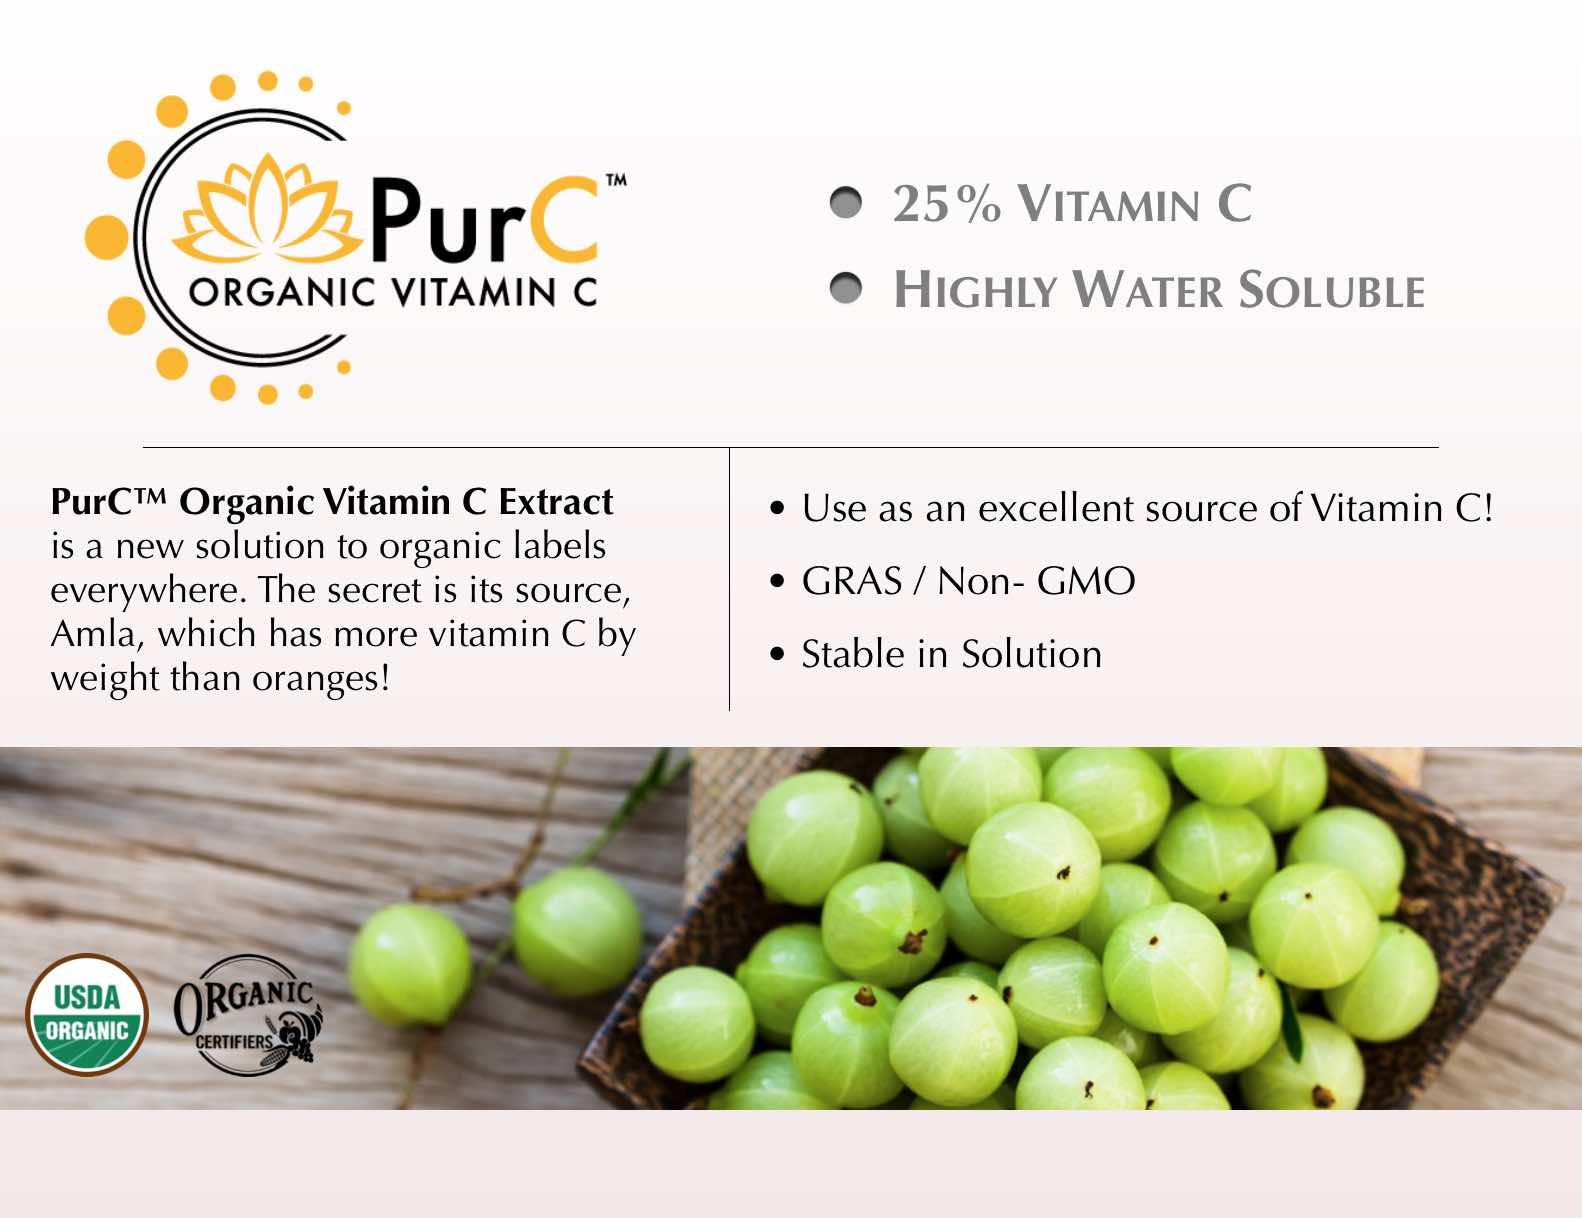 Organic Vitamin C Extract Supplier PurC